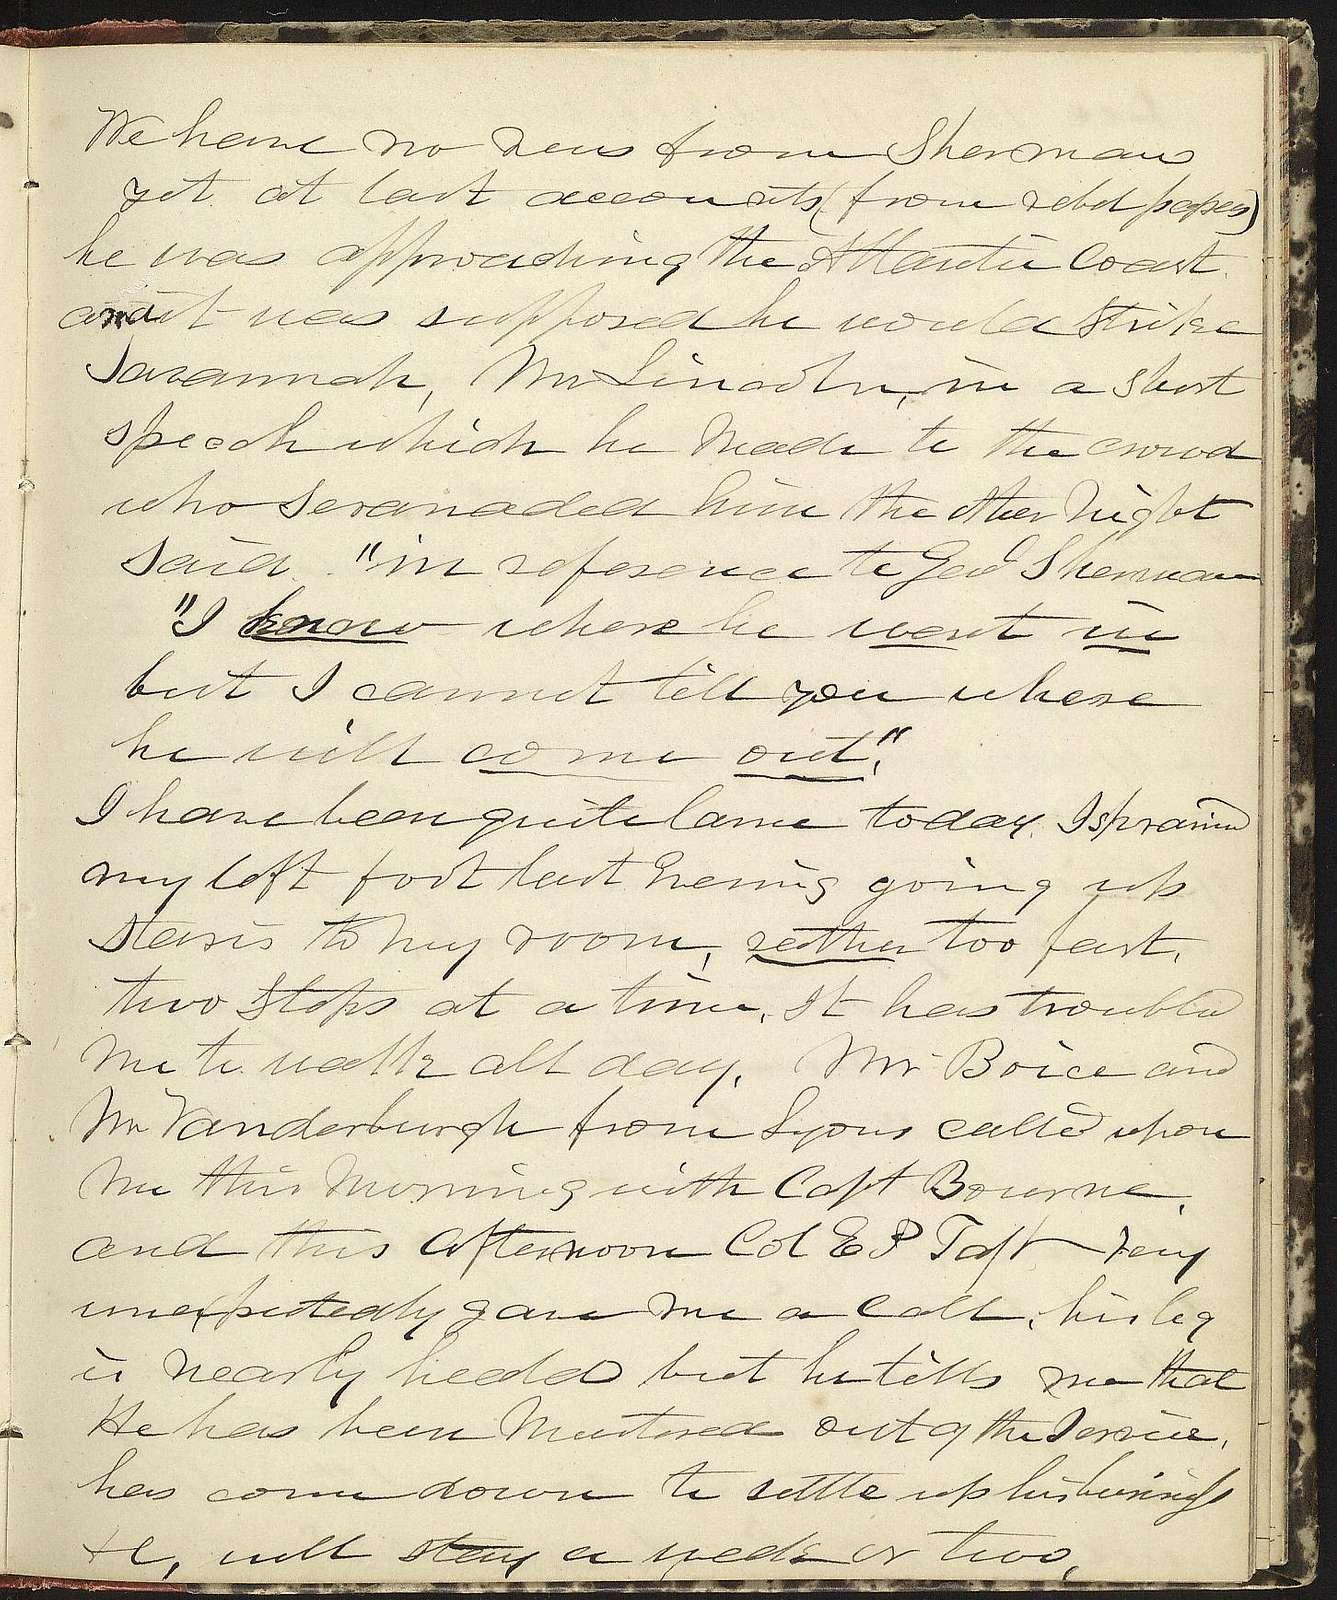 The Diary of Horatio Nelson Taft, 1861-1865. Volume 3, January 1, 1864-May 30, 1865